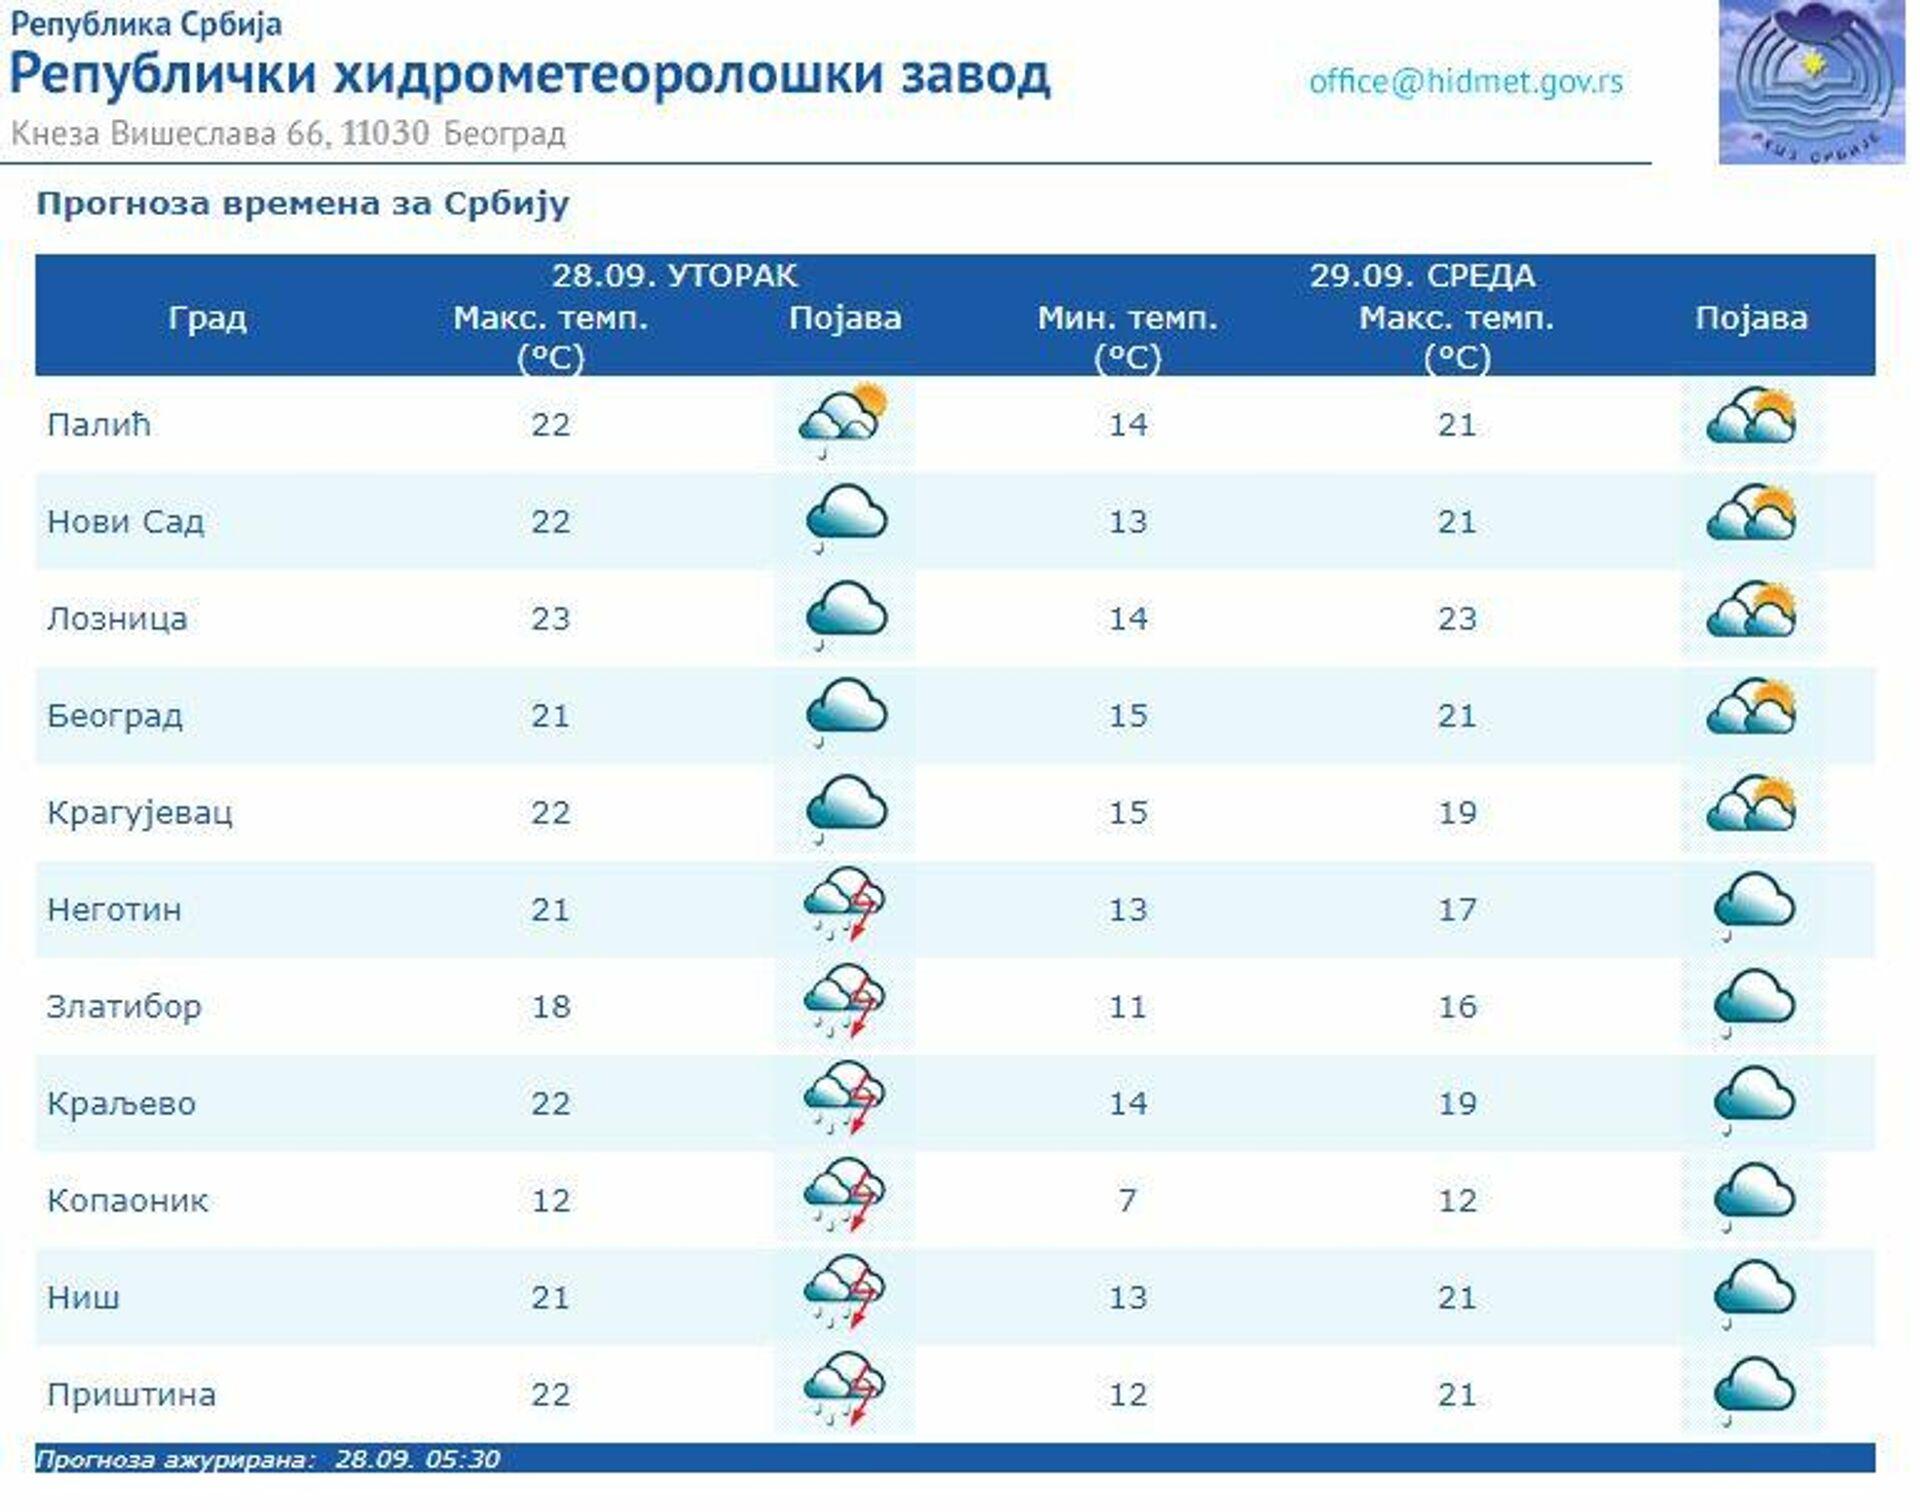 Vremenska prognoza za 28. 9. 2021. - Sputnik Srbija, 1920, 28.09.2021